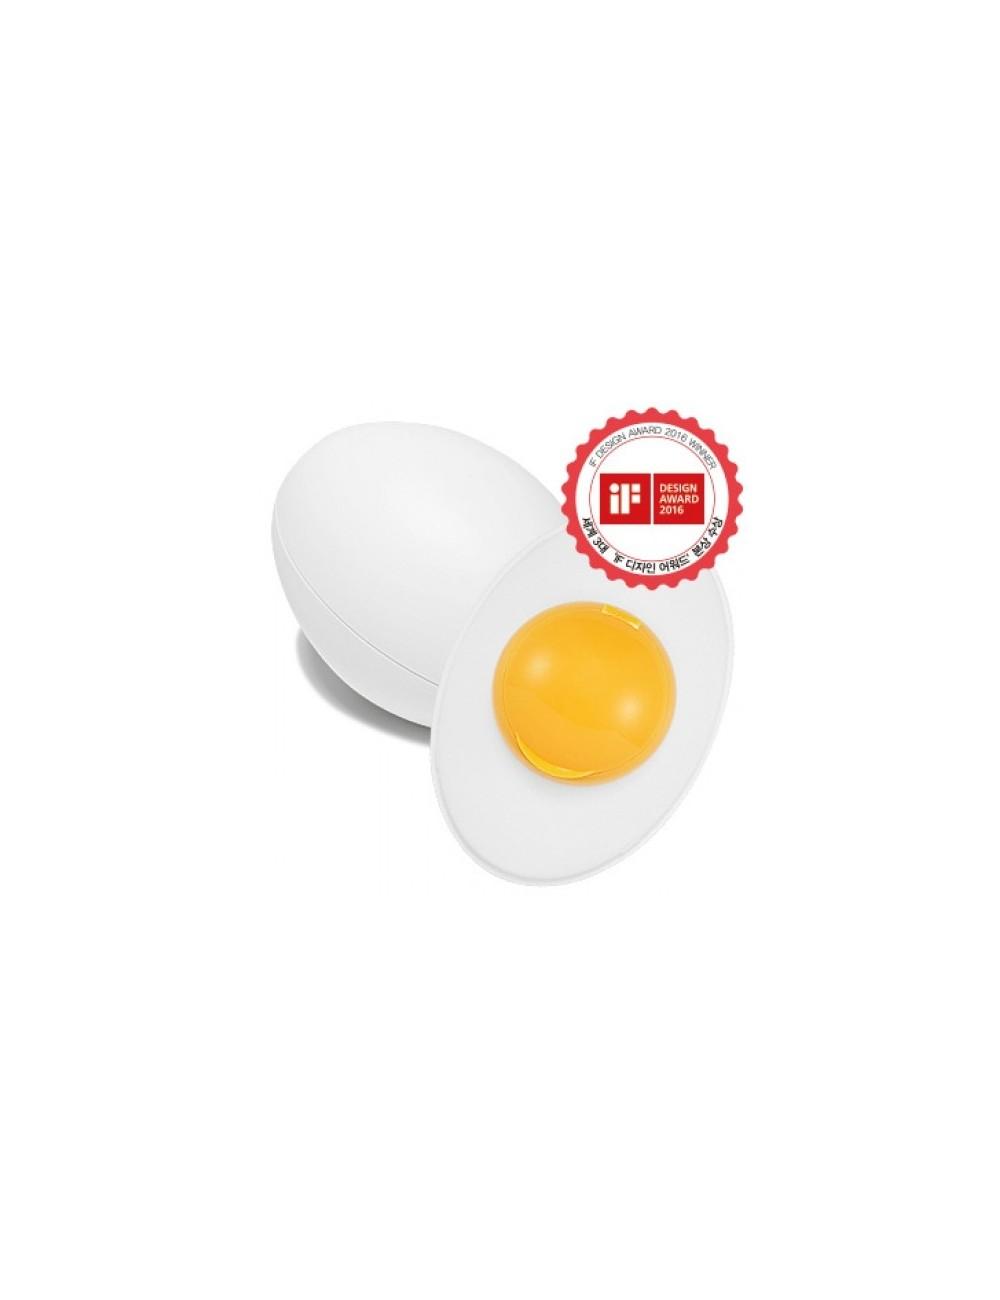 Holika Holika Exfoliante en Gel Smooth Egg Skin Peeling Gel